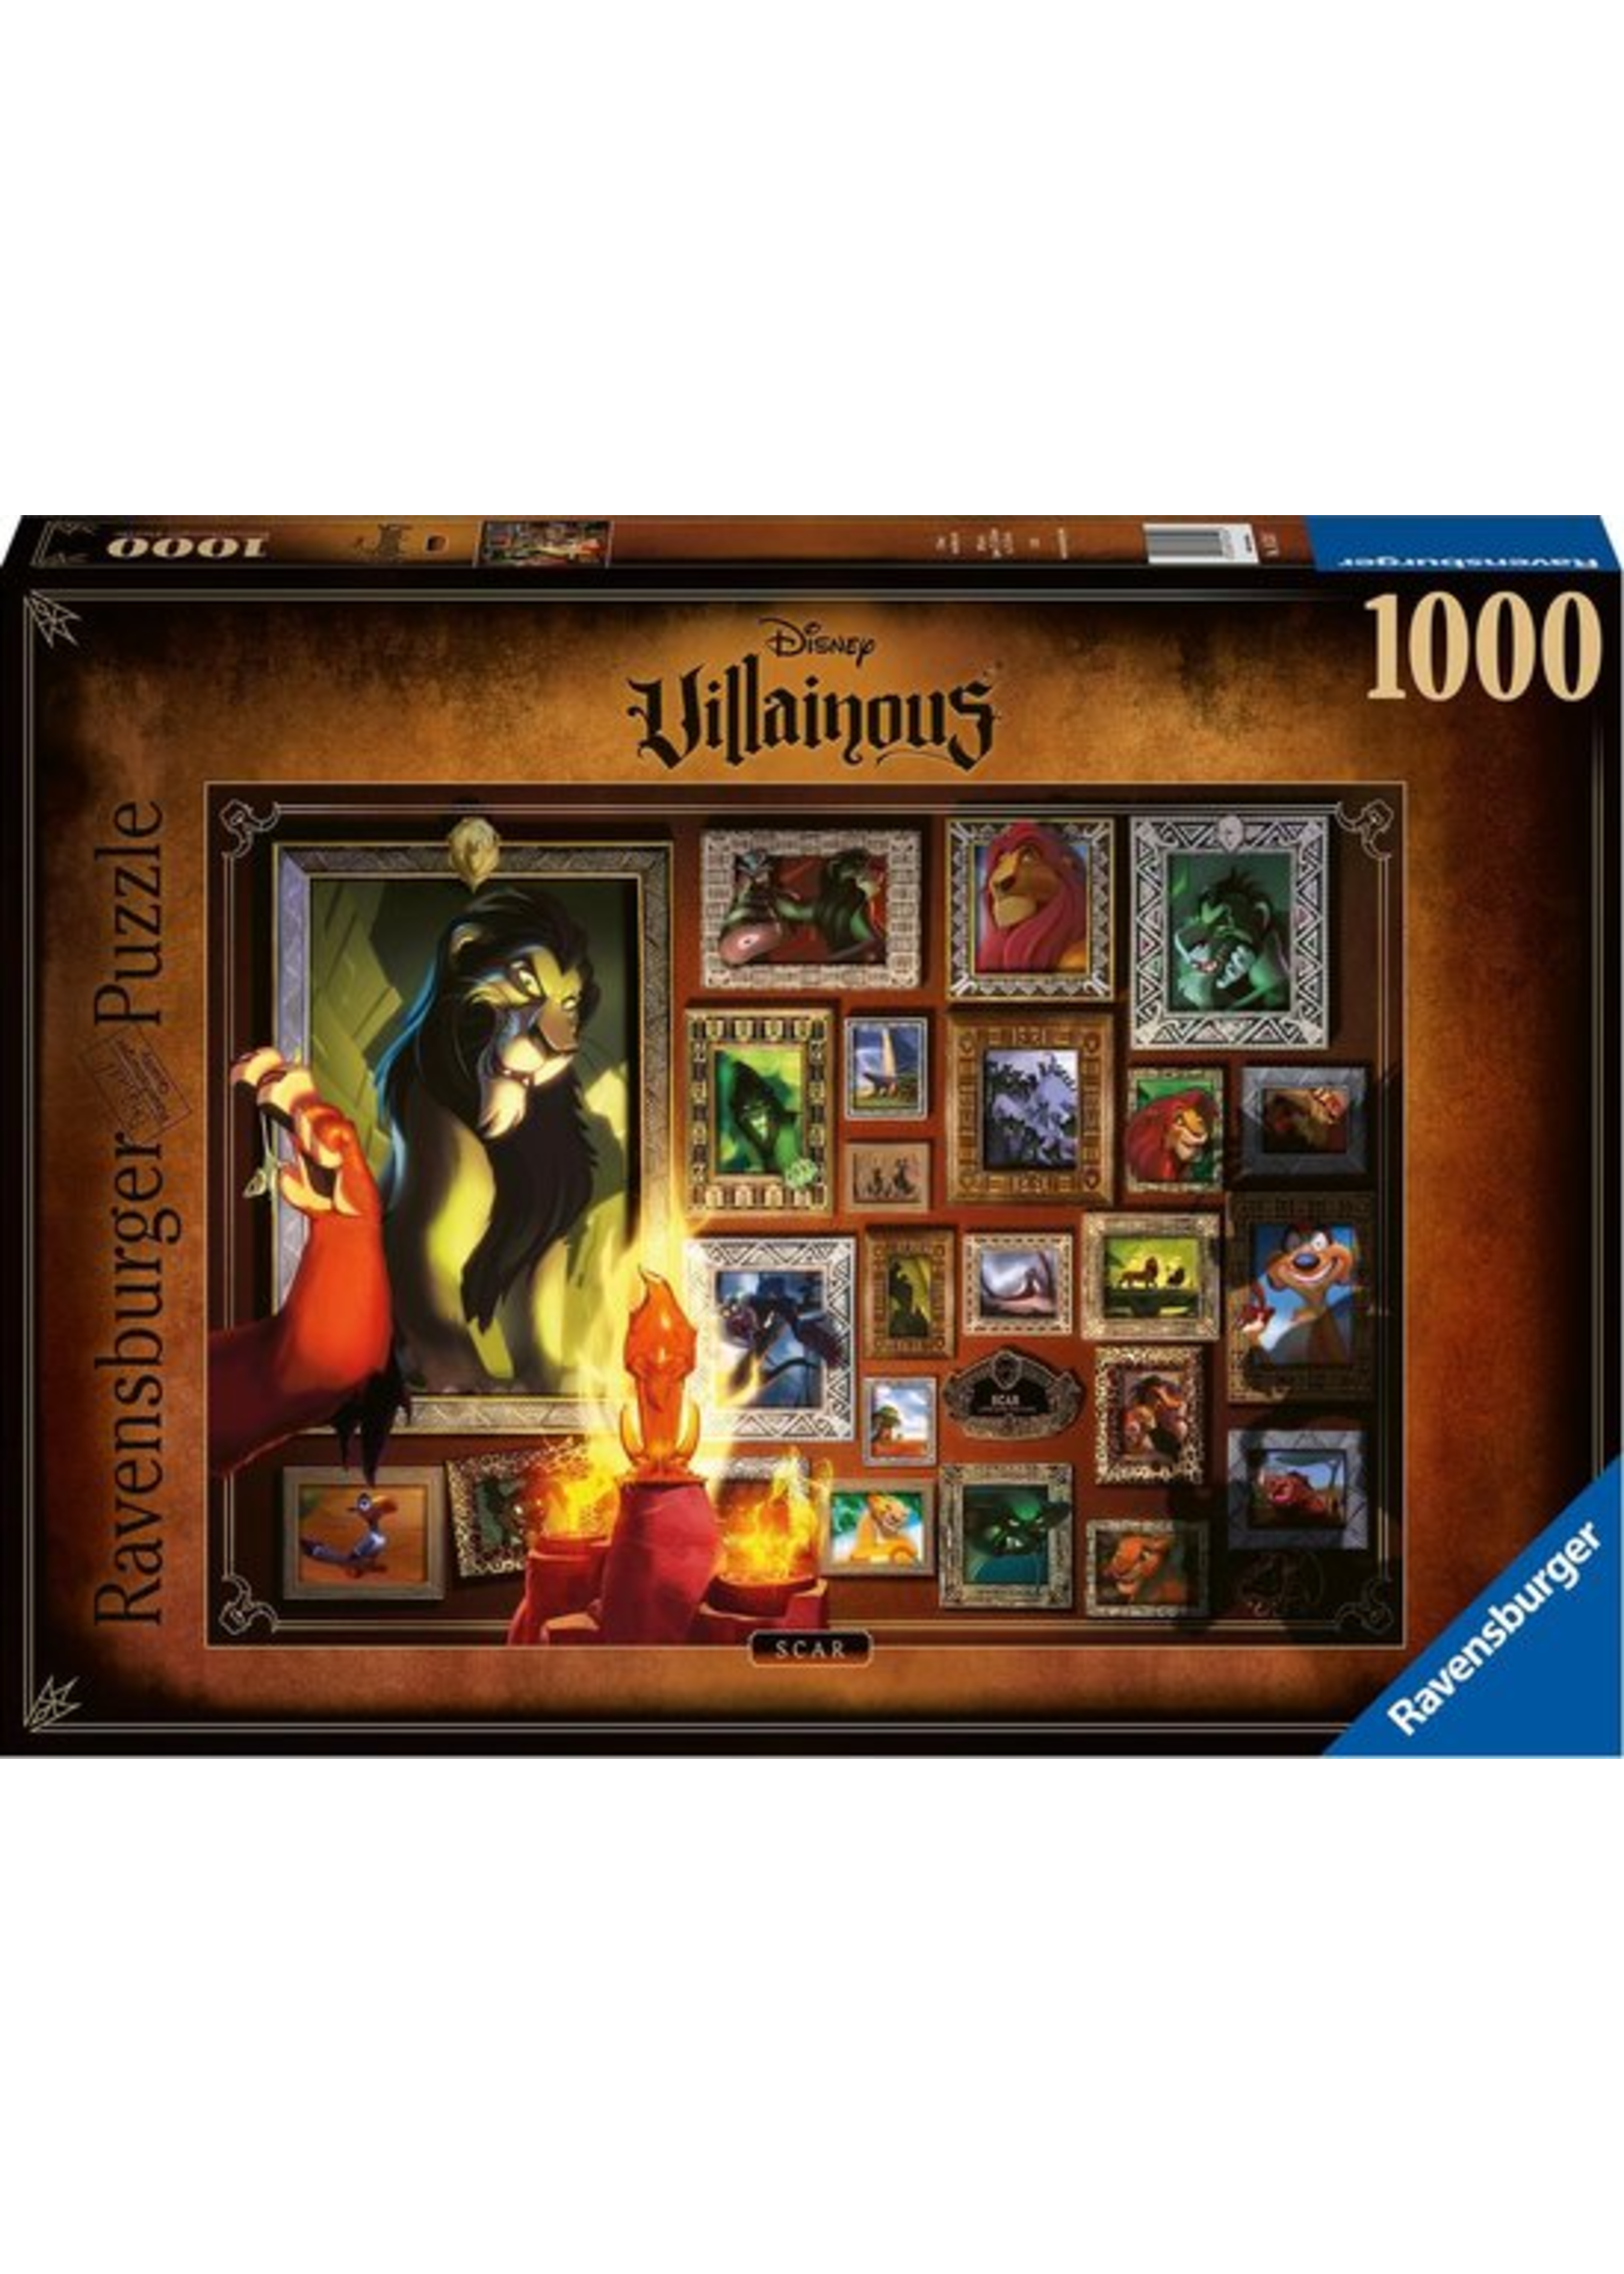 Disney Villainous - Scar (1000)